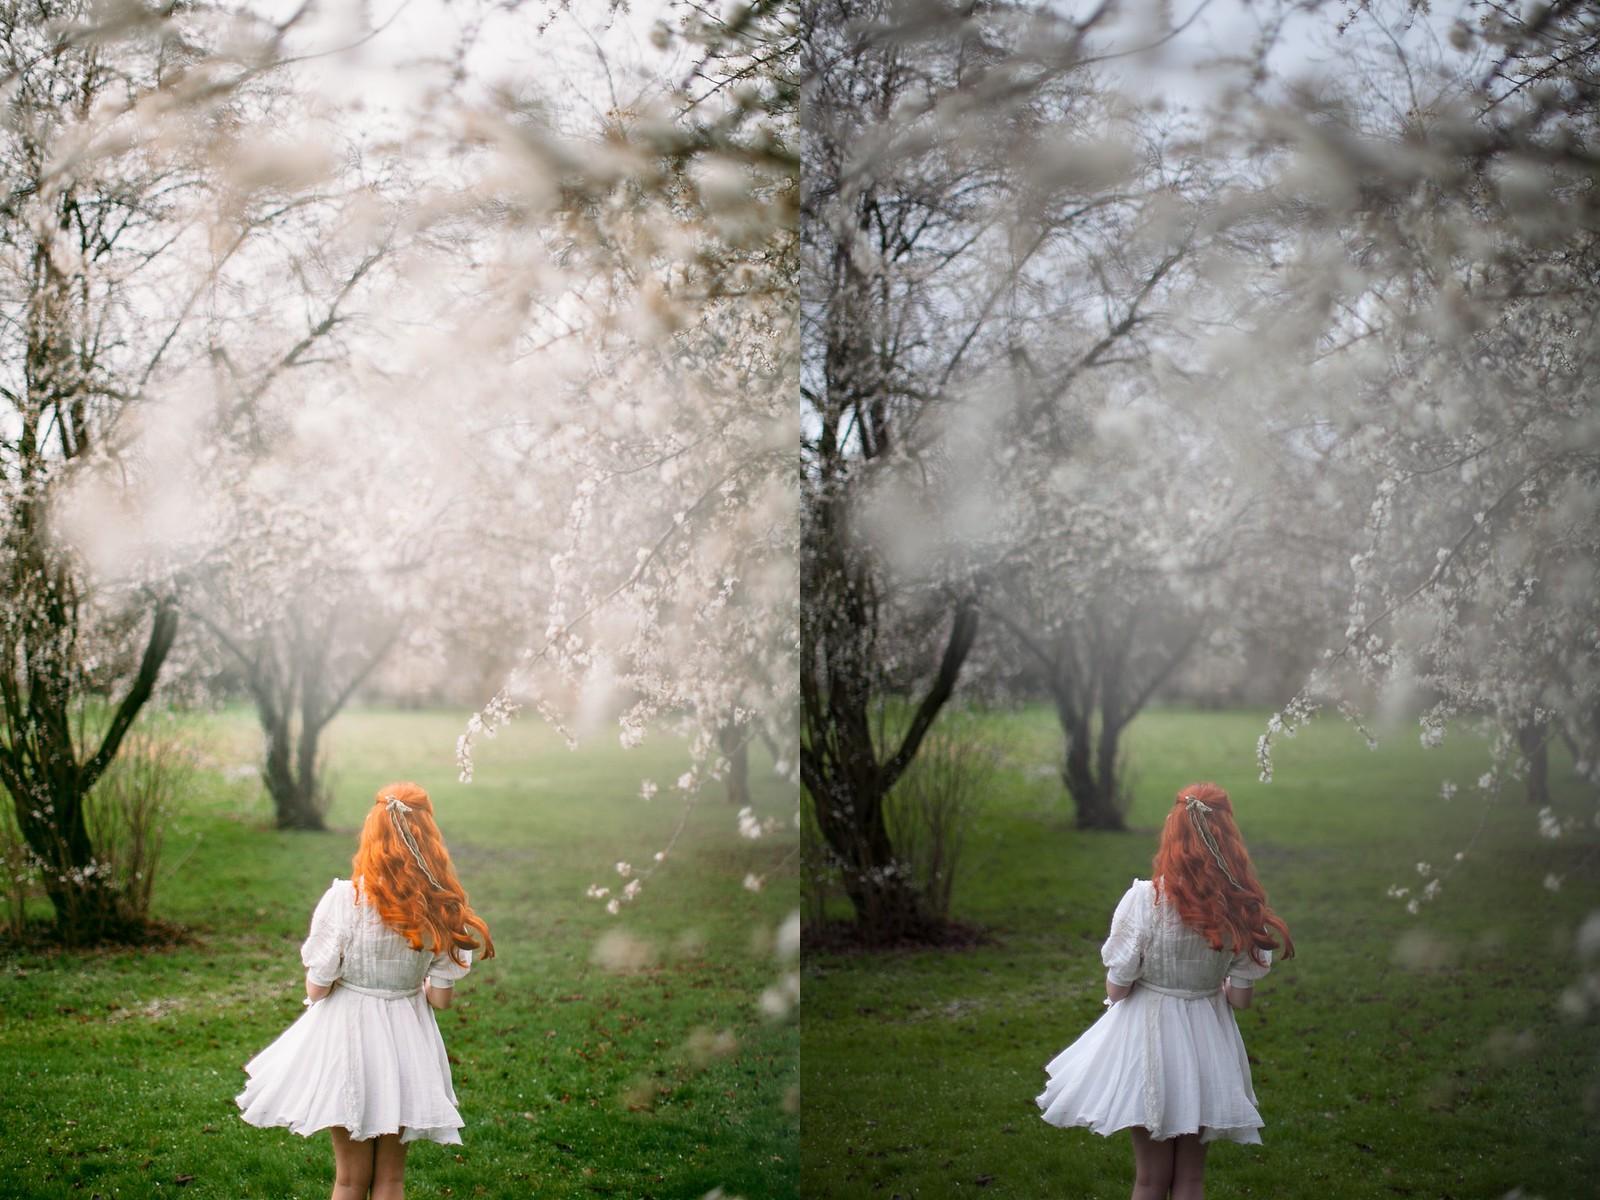 daffodilscollage